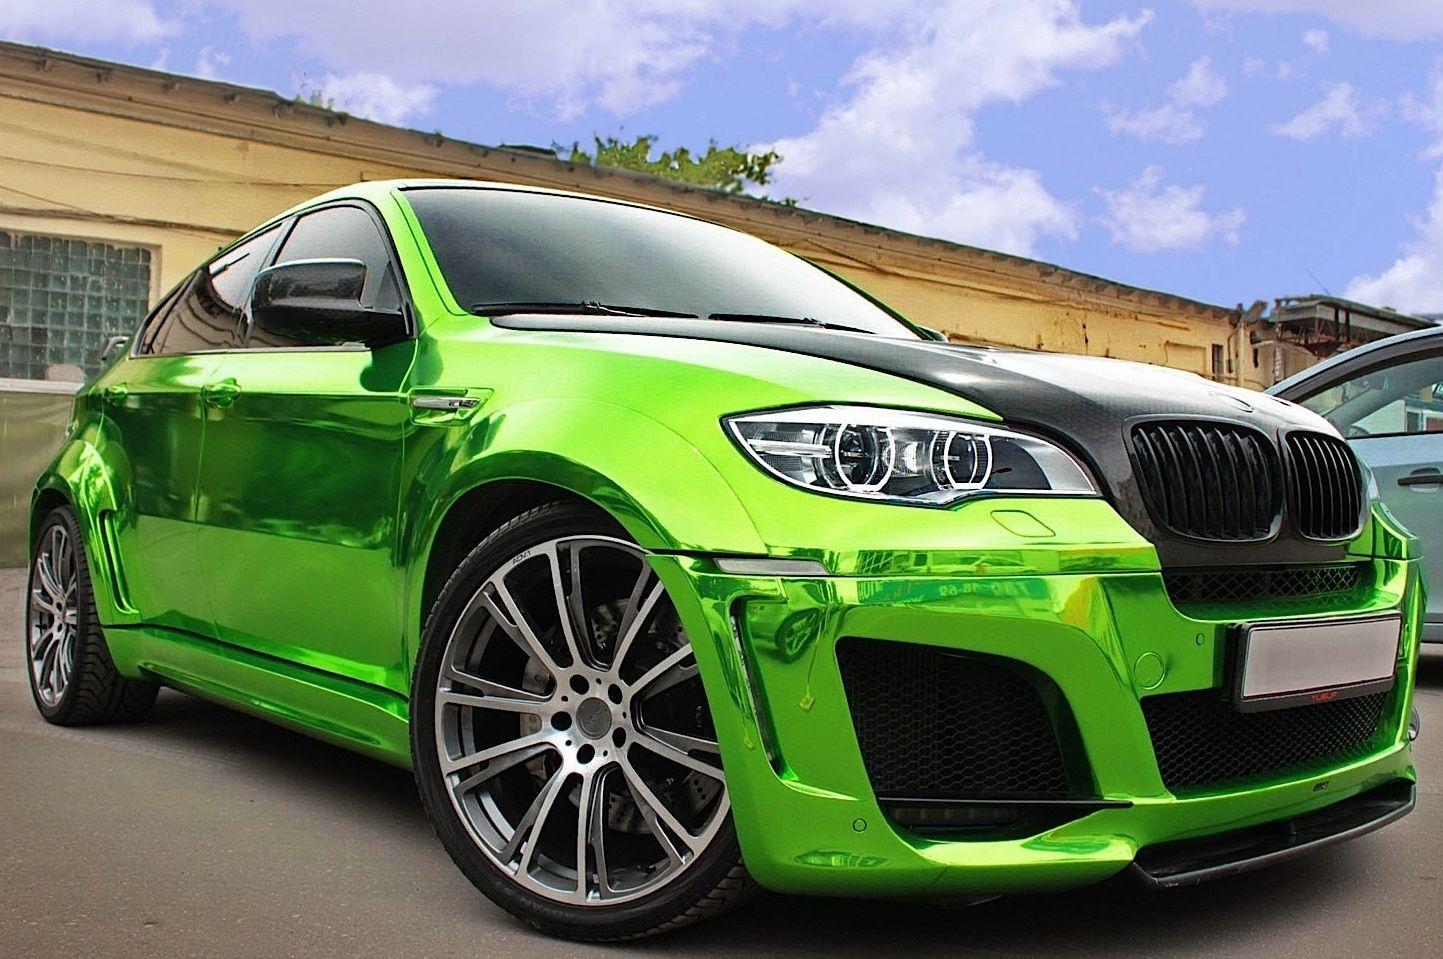 Chrome green BMW Car, Bmw x6, Bmw